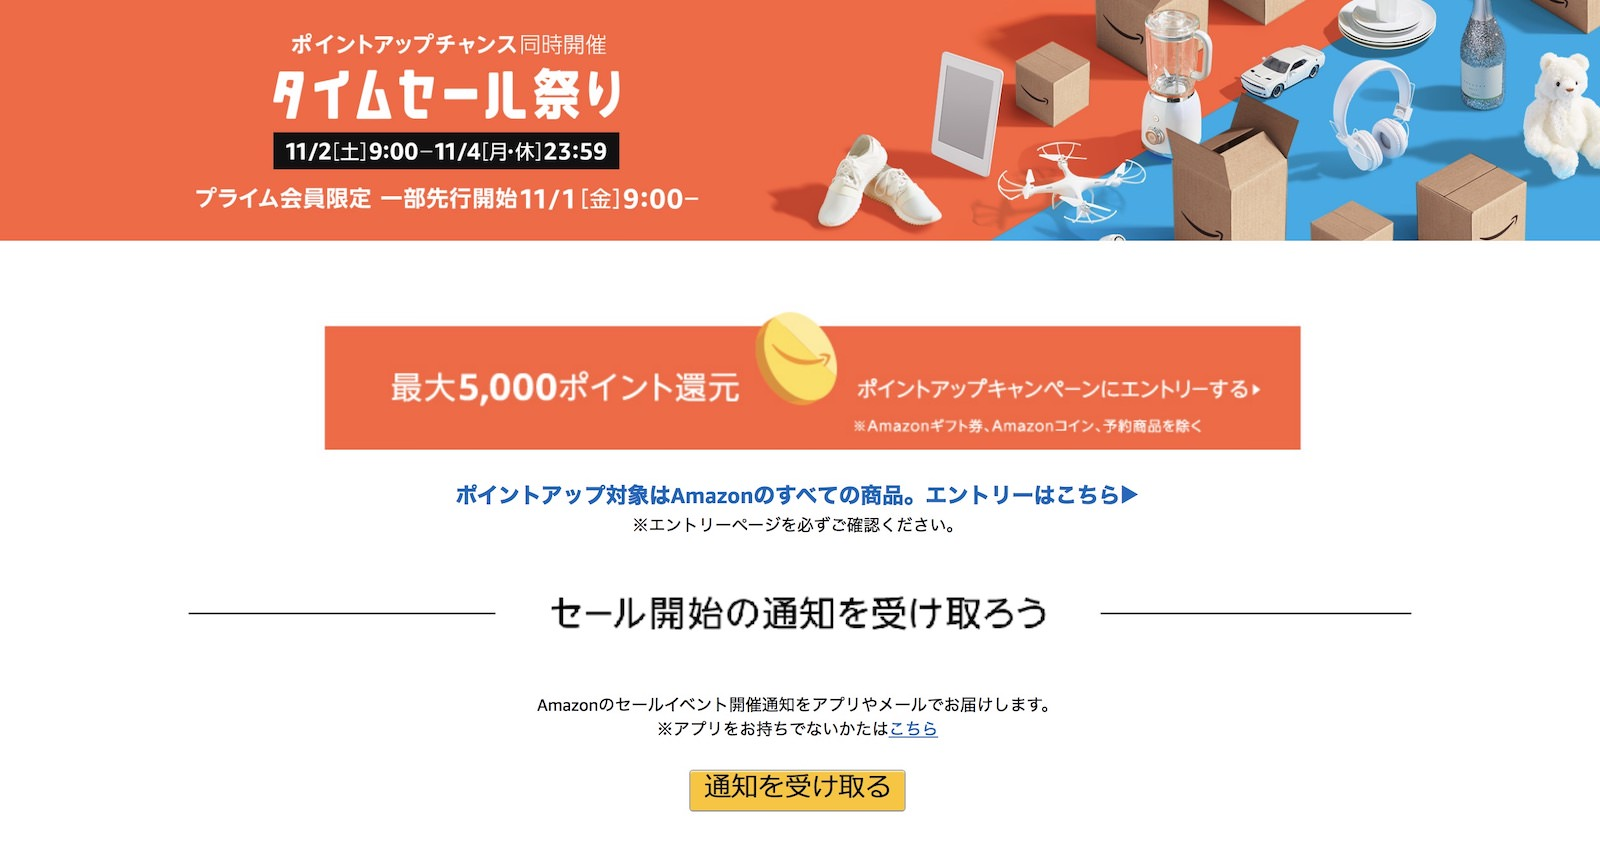 Amazon-TimeSale-Matsuri.jpg